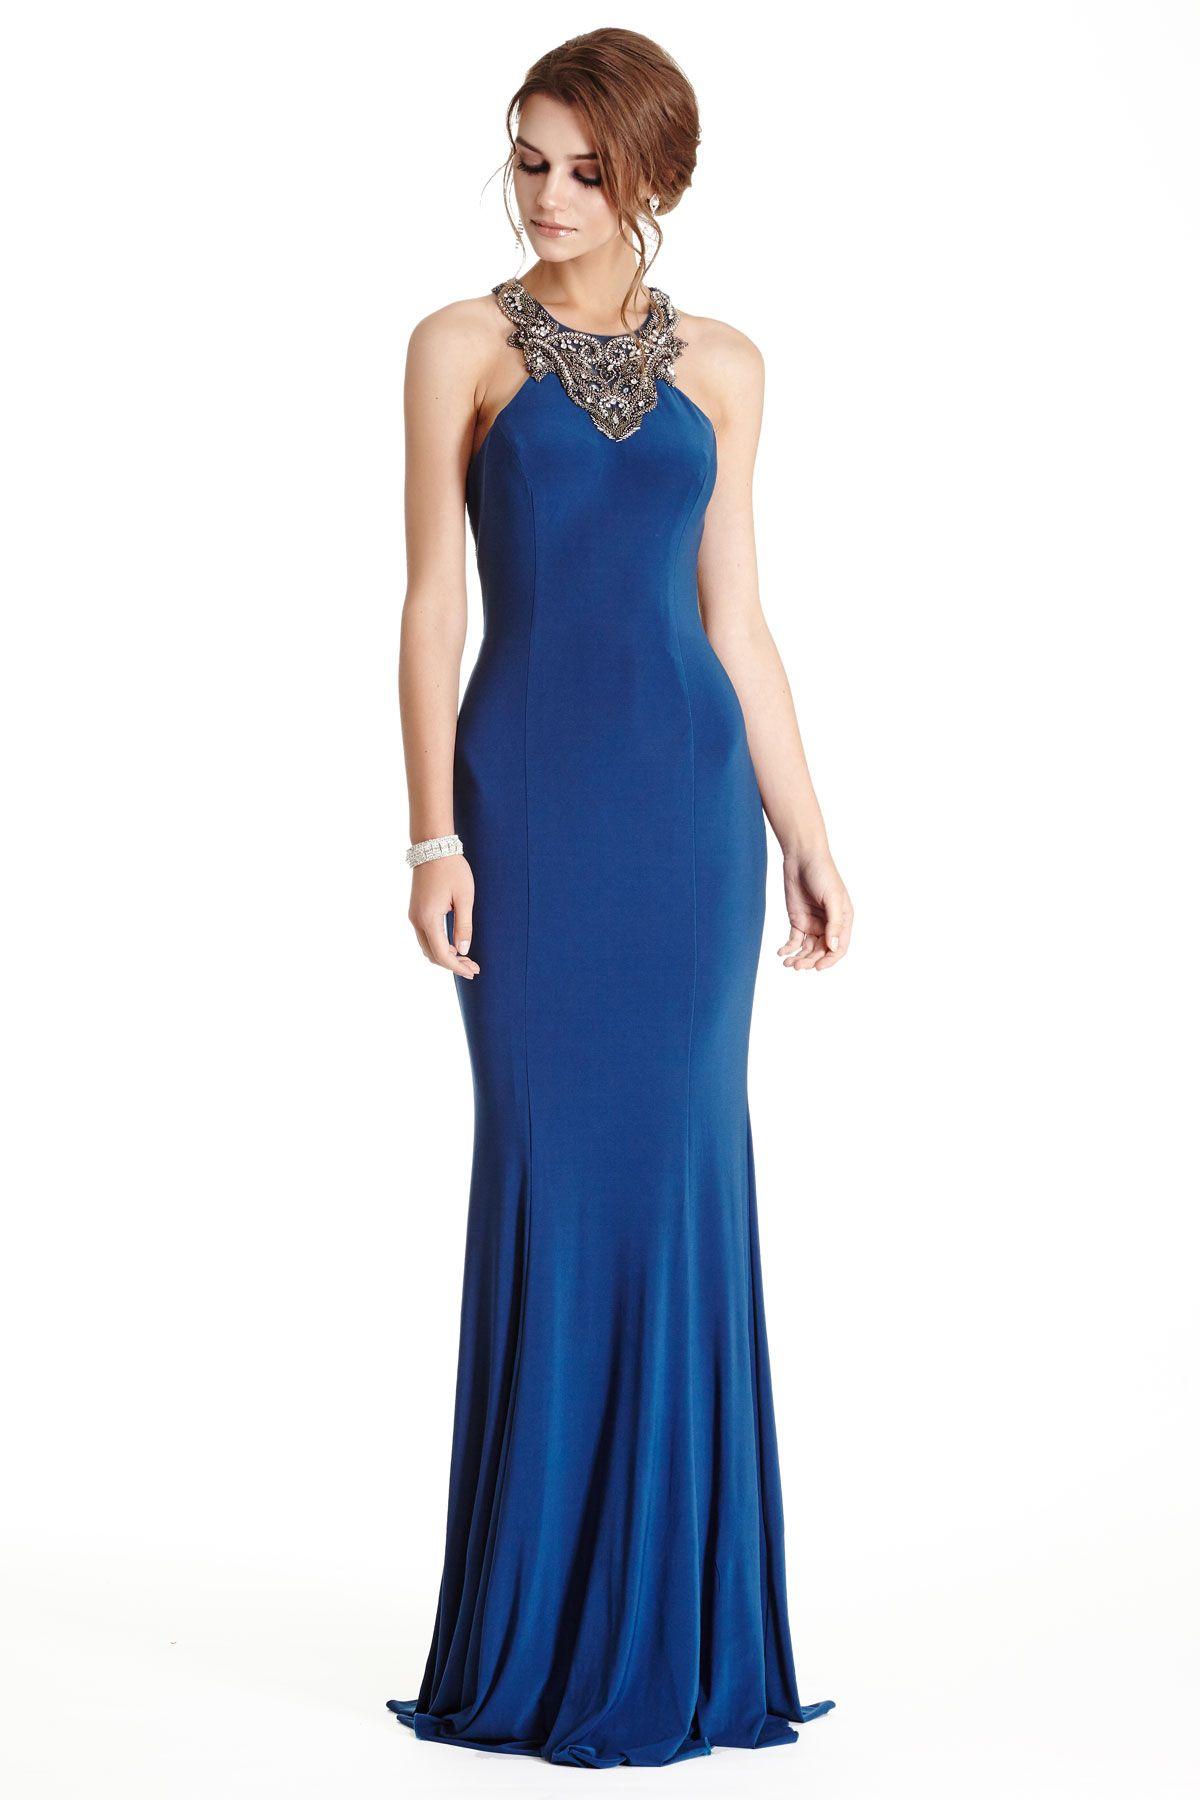 Elegant evening gown apl cfashionwholesale